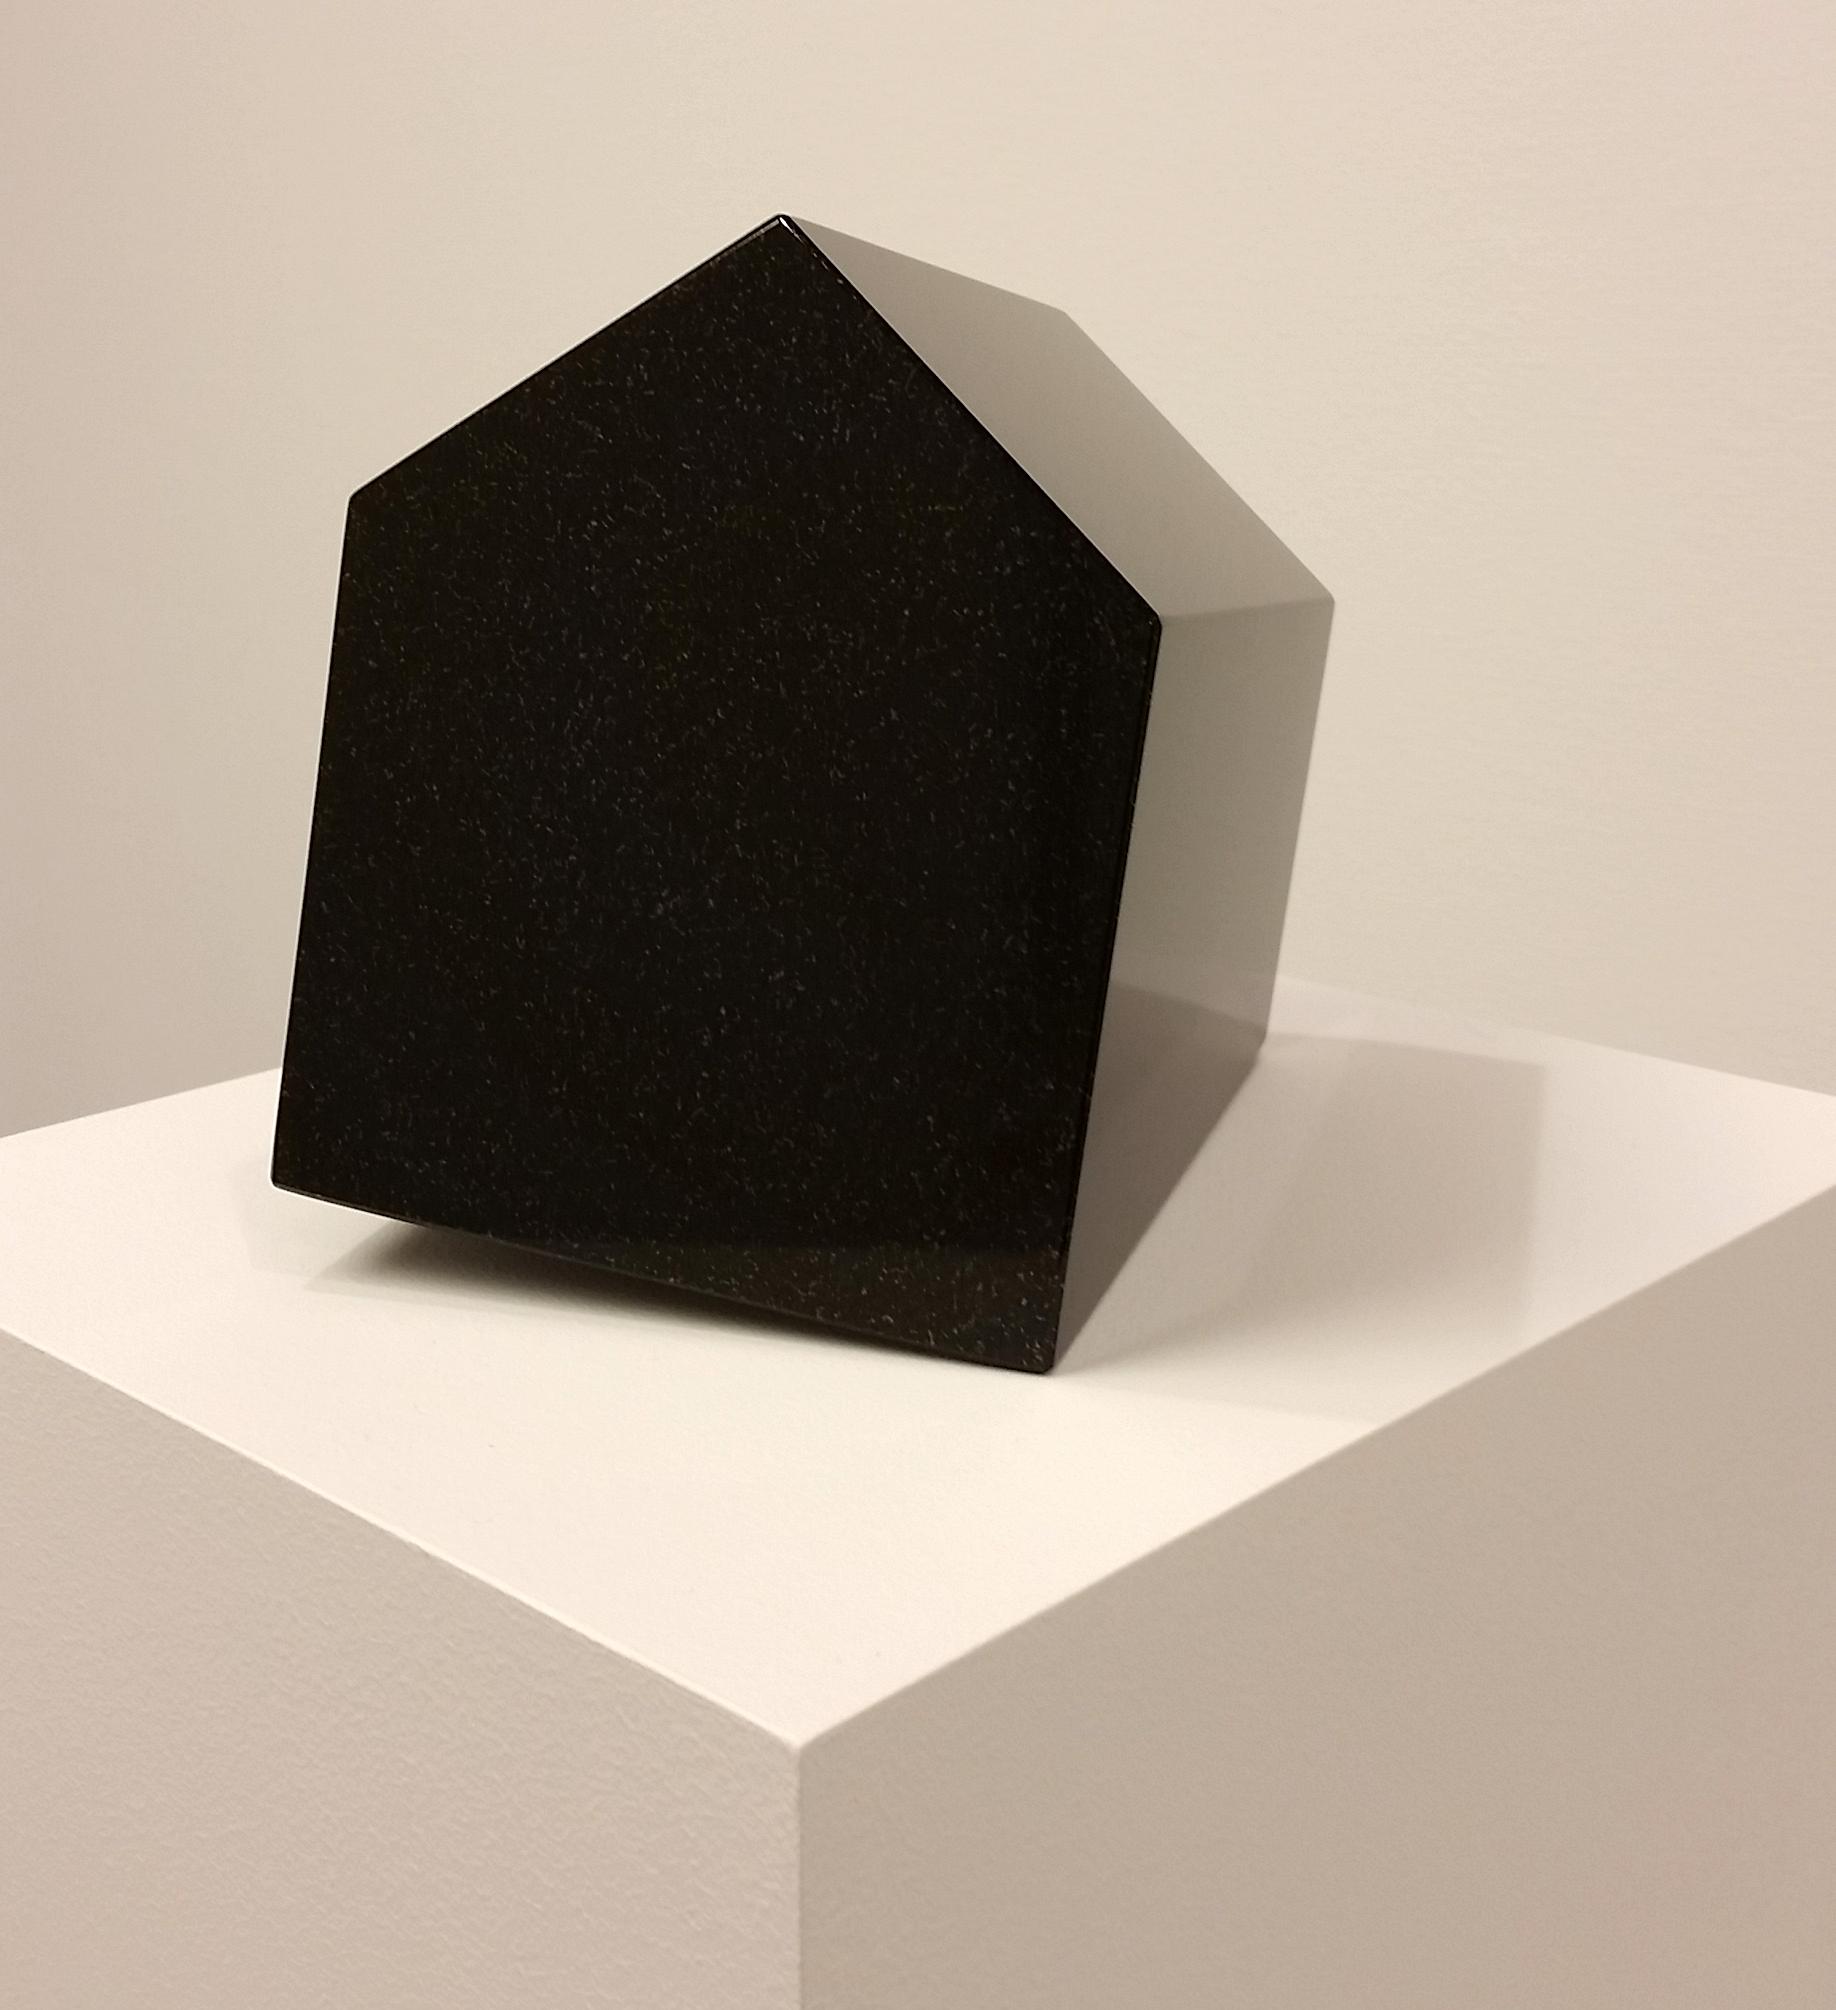 Härbärge (2014), diabas, 19x19x17cm. ©Hillevi Berglund / Bildupphovsrätt (2017).